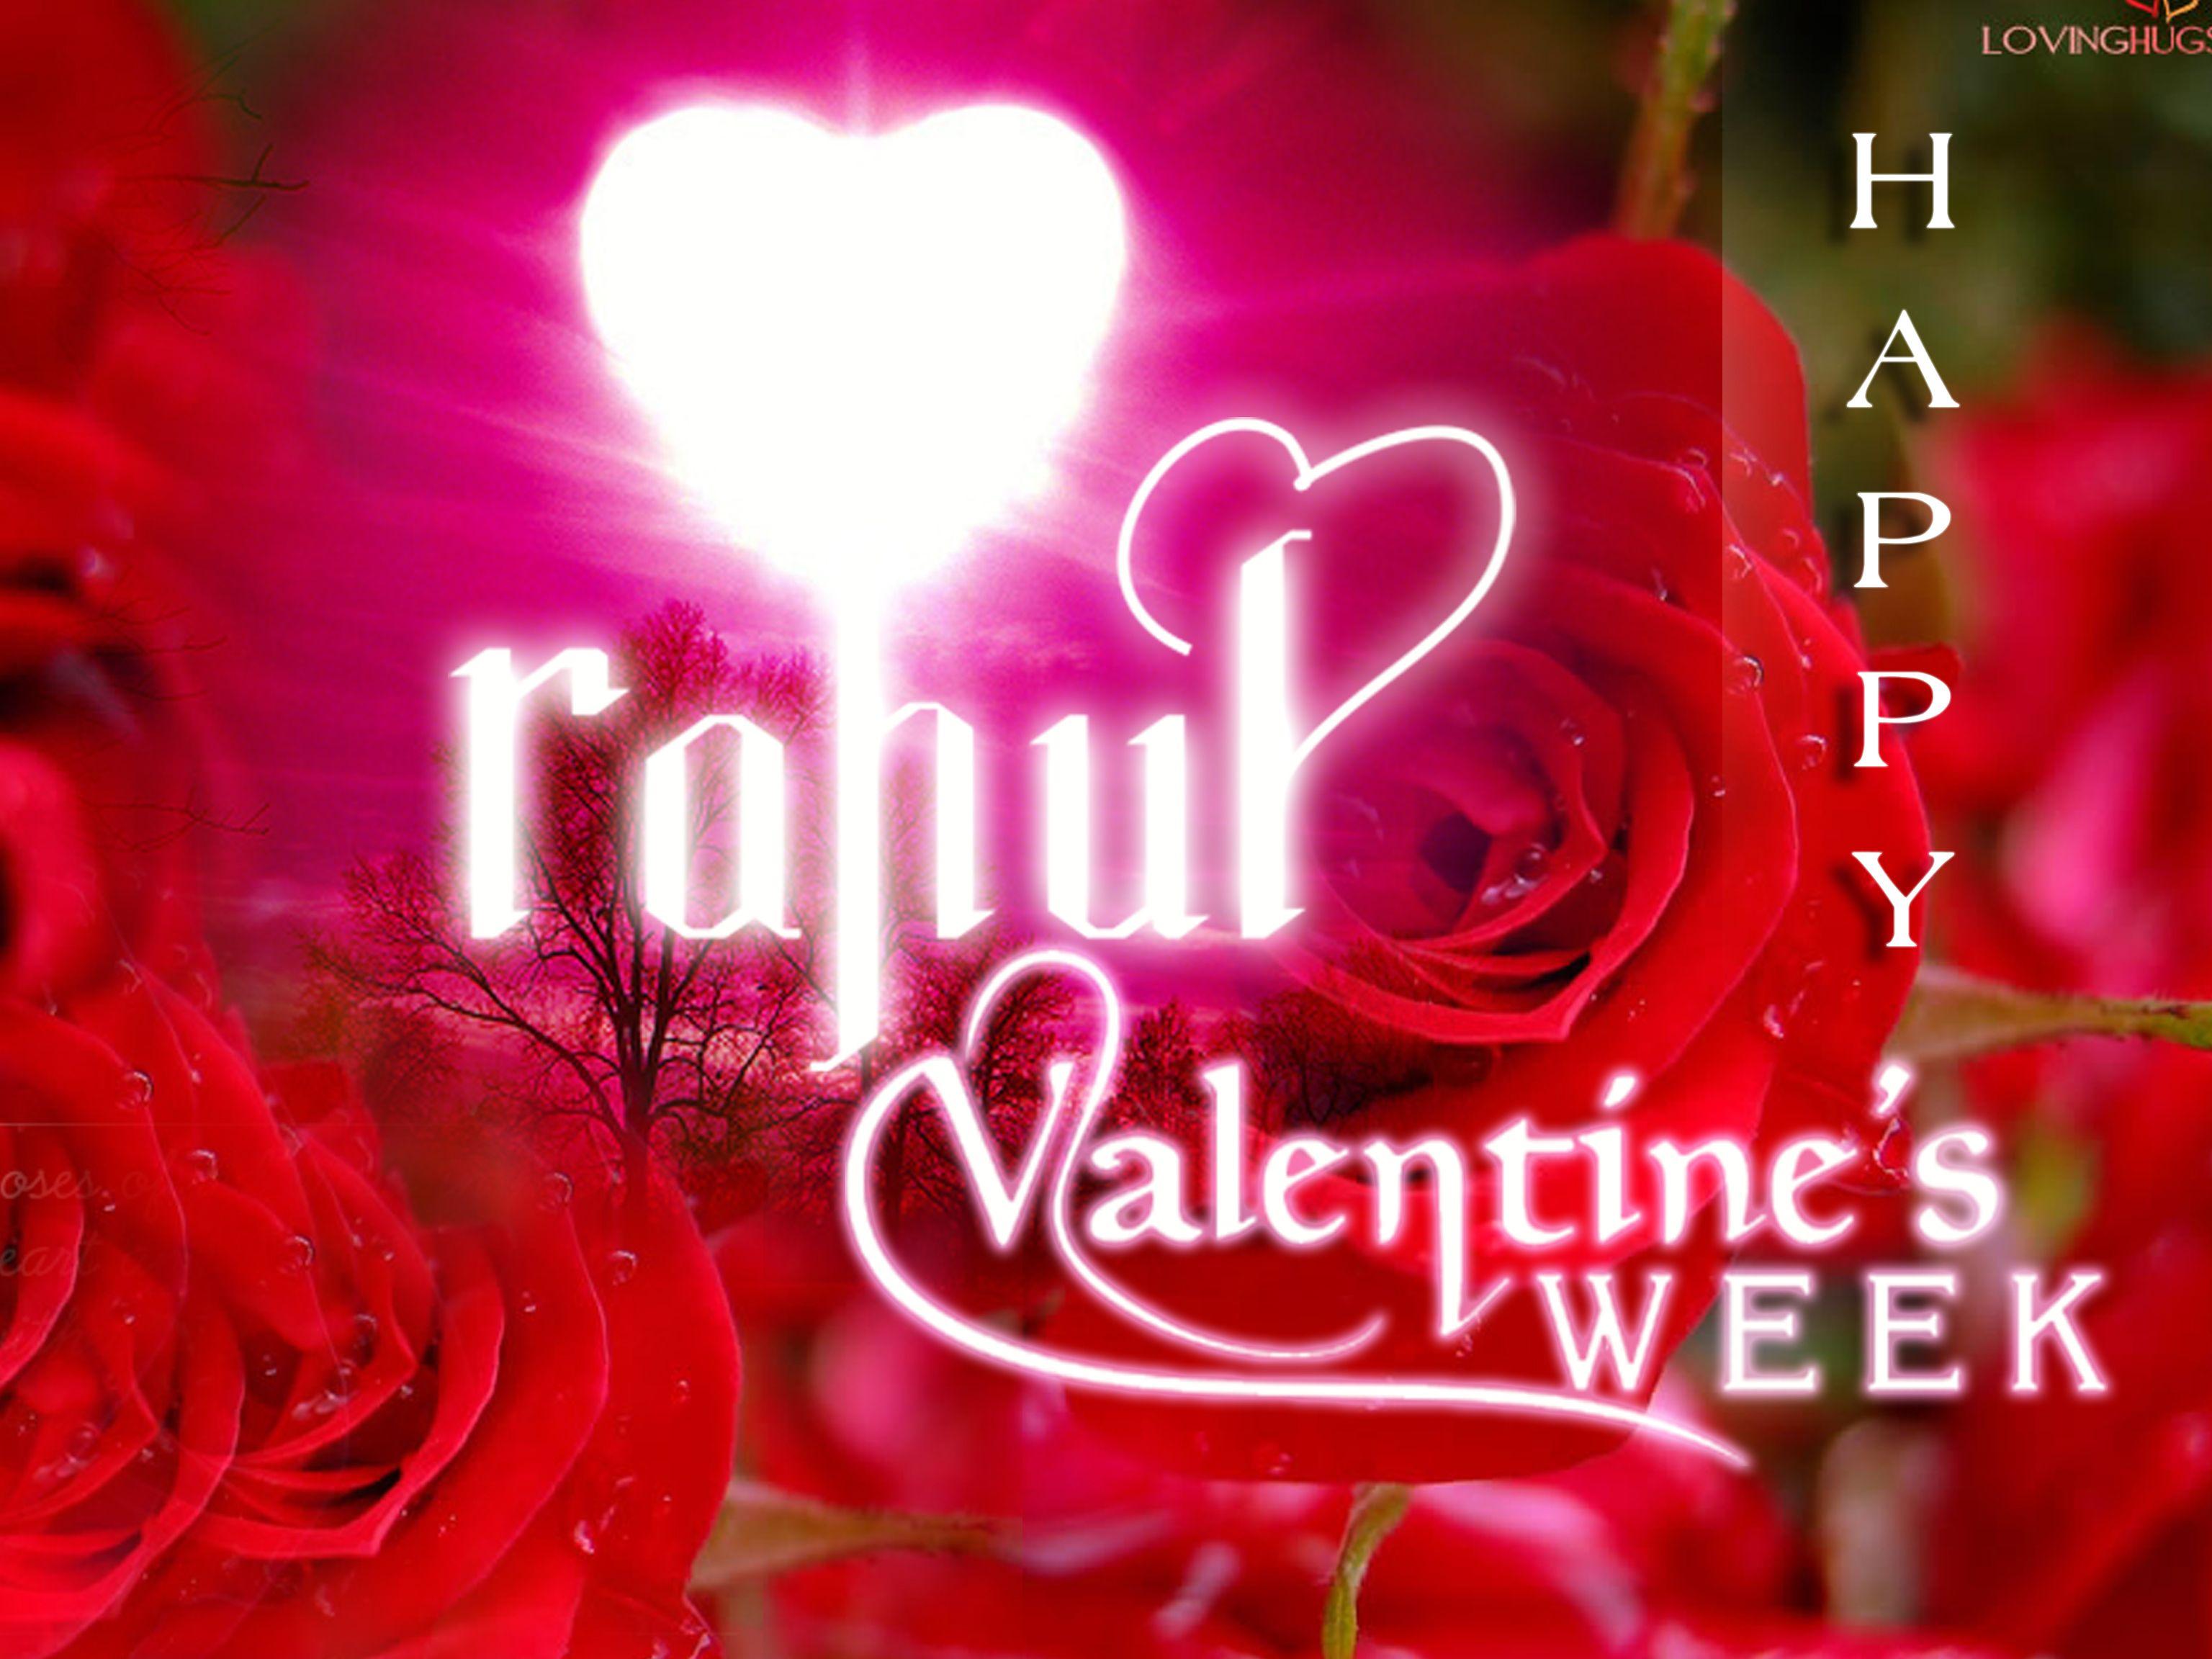 Creative Name Rahul Happy Valentines Week My Some Own Created